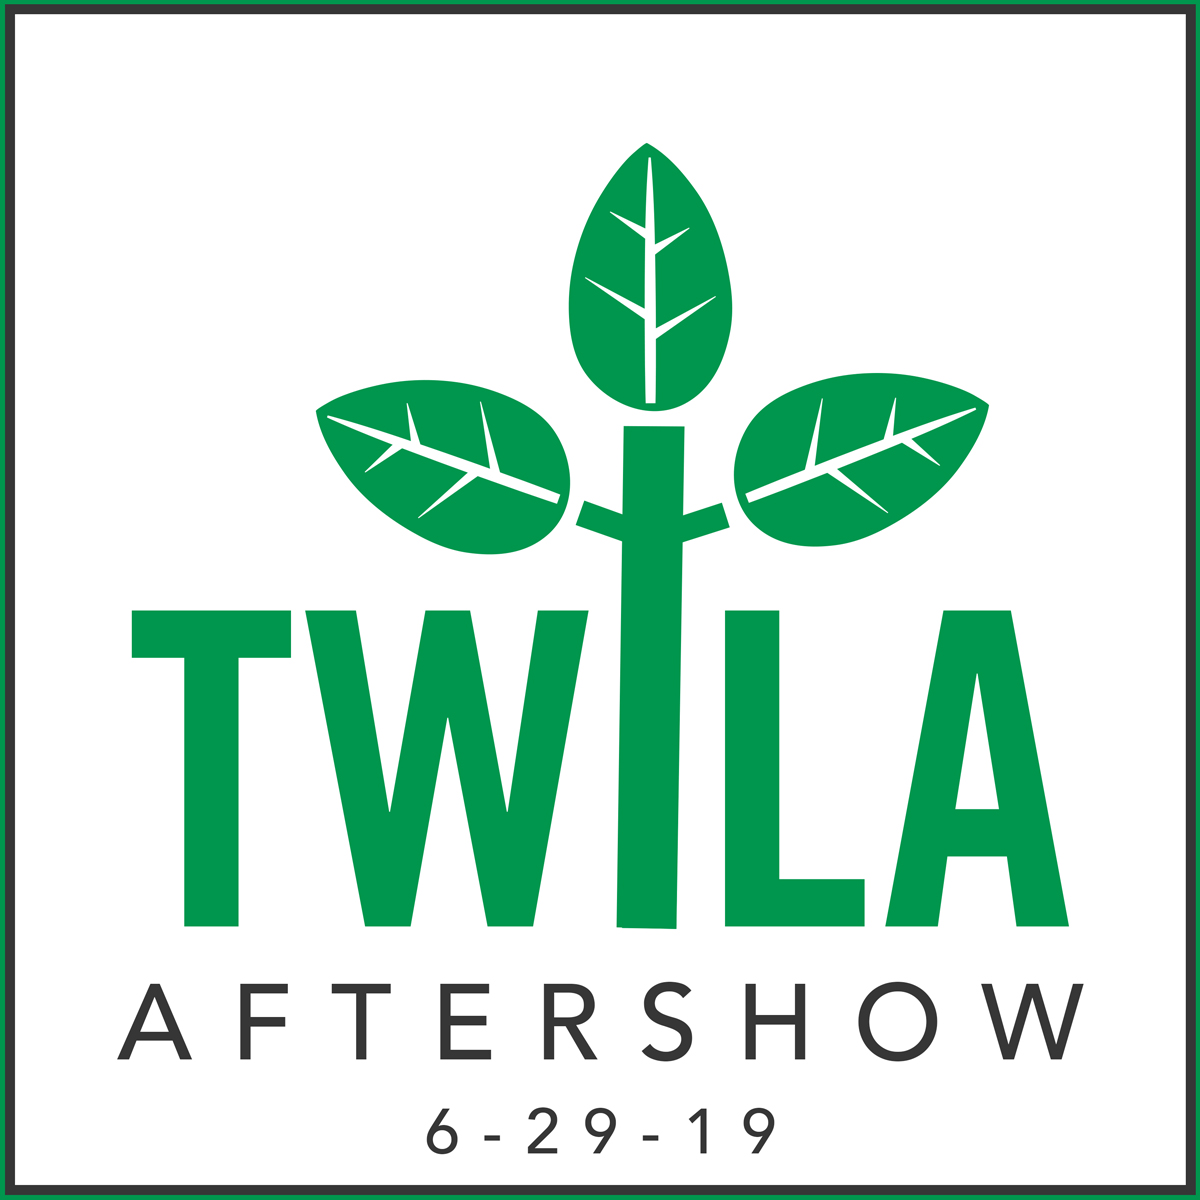 TWILA-After-Show-TN---6-29-19.jpg